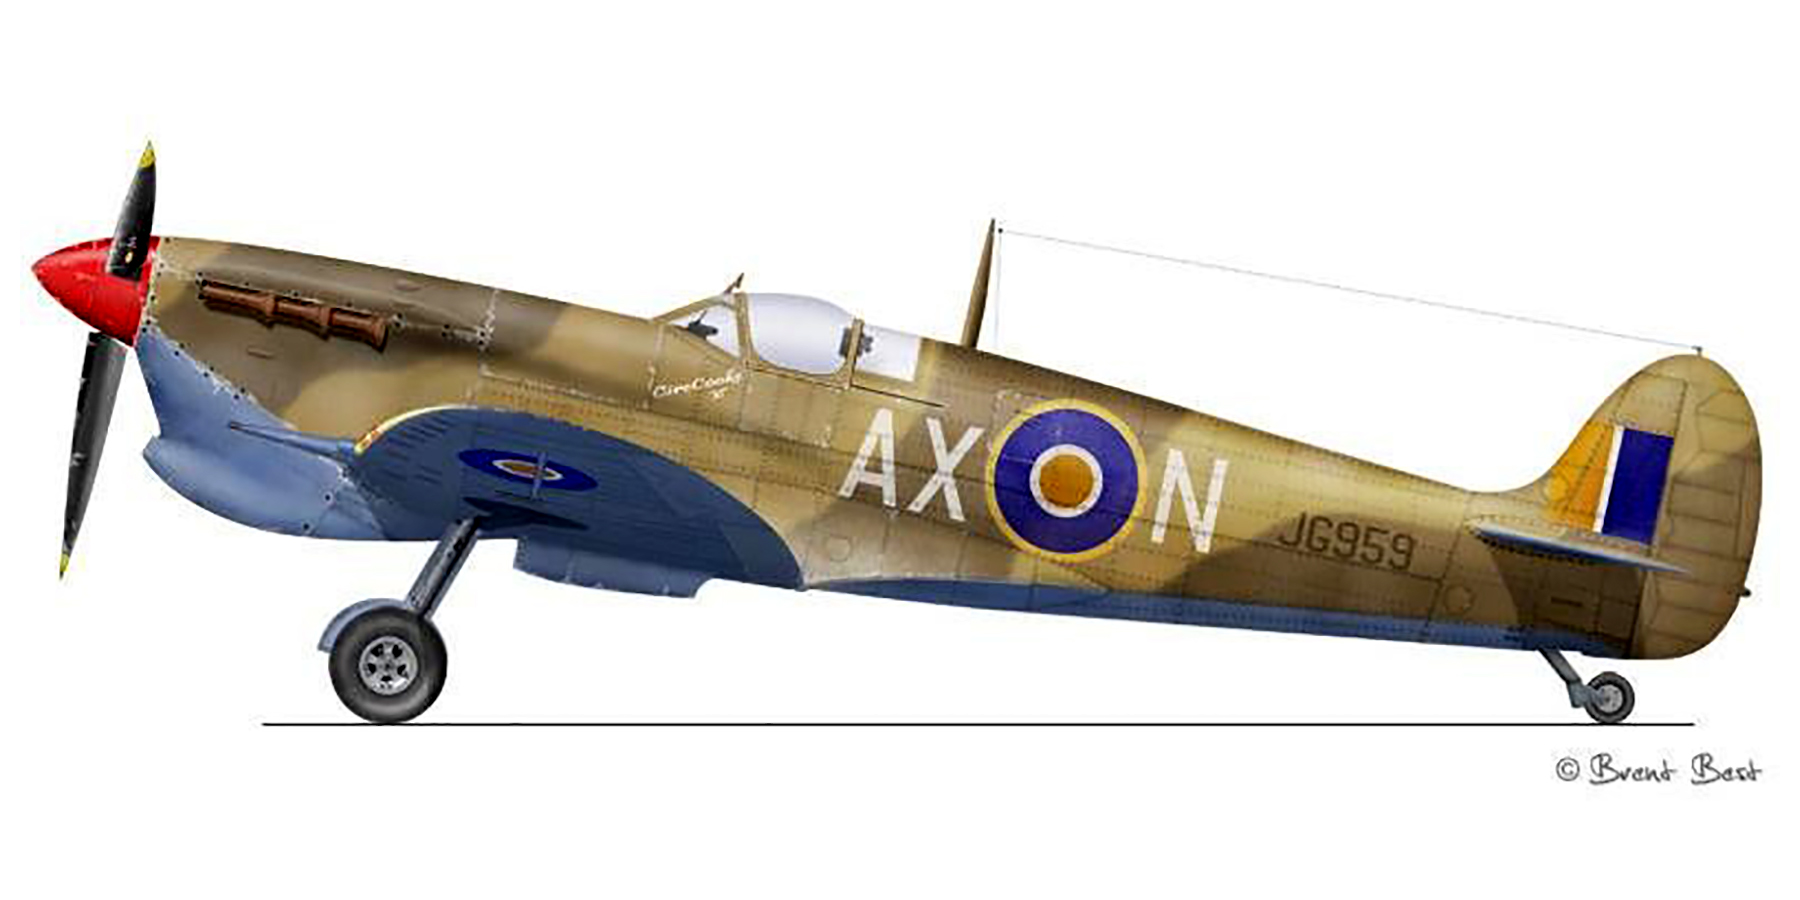 Spitfire MkVcTrop SAAF 1Sqn AXN JG959 Tunisia 1943 0A